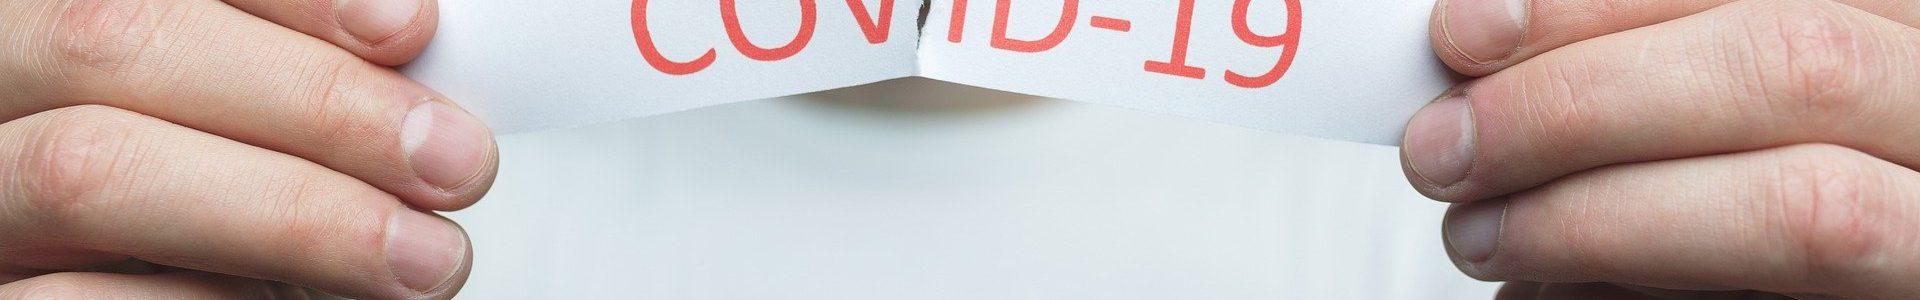 Odklad plateb nájemného v souvislosti s COVID-19